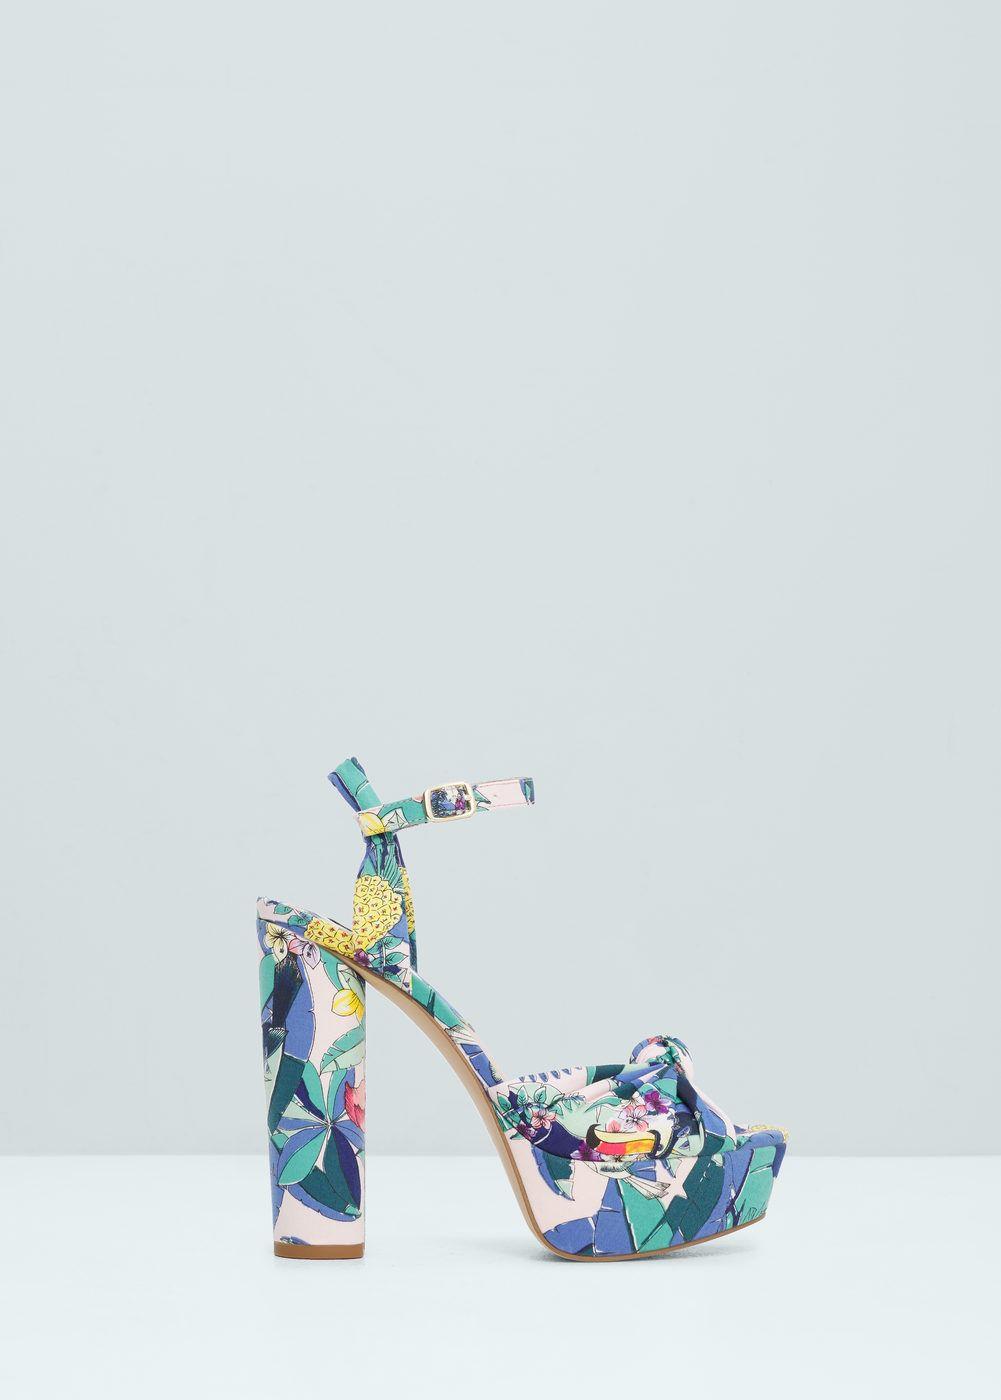 Sandalia estampada plataforma - Zapatos de Mujer  5fbeee0a55e